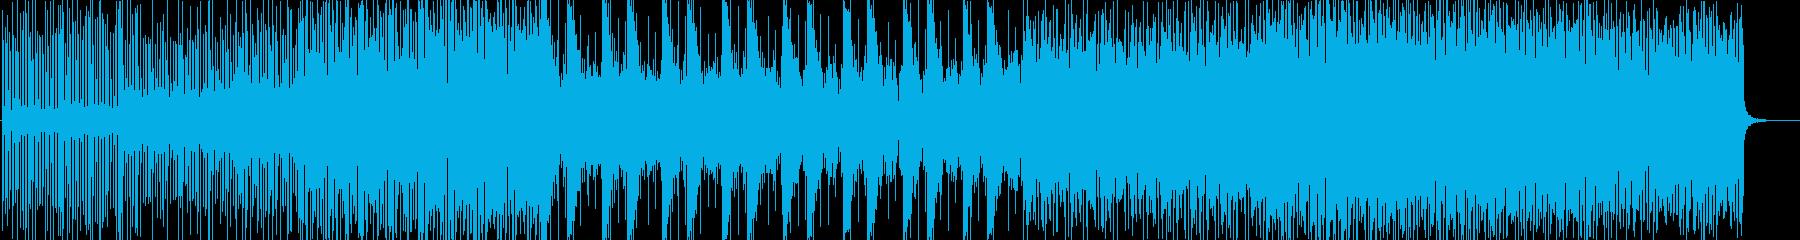 IT-デジタル-ニュース-SF-株価FXの再生済みの波形